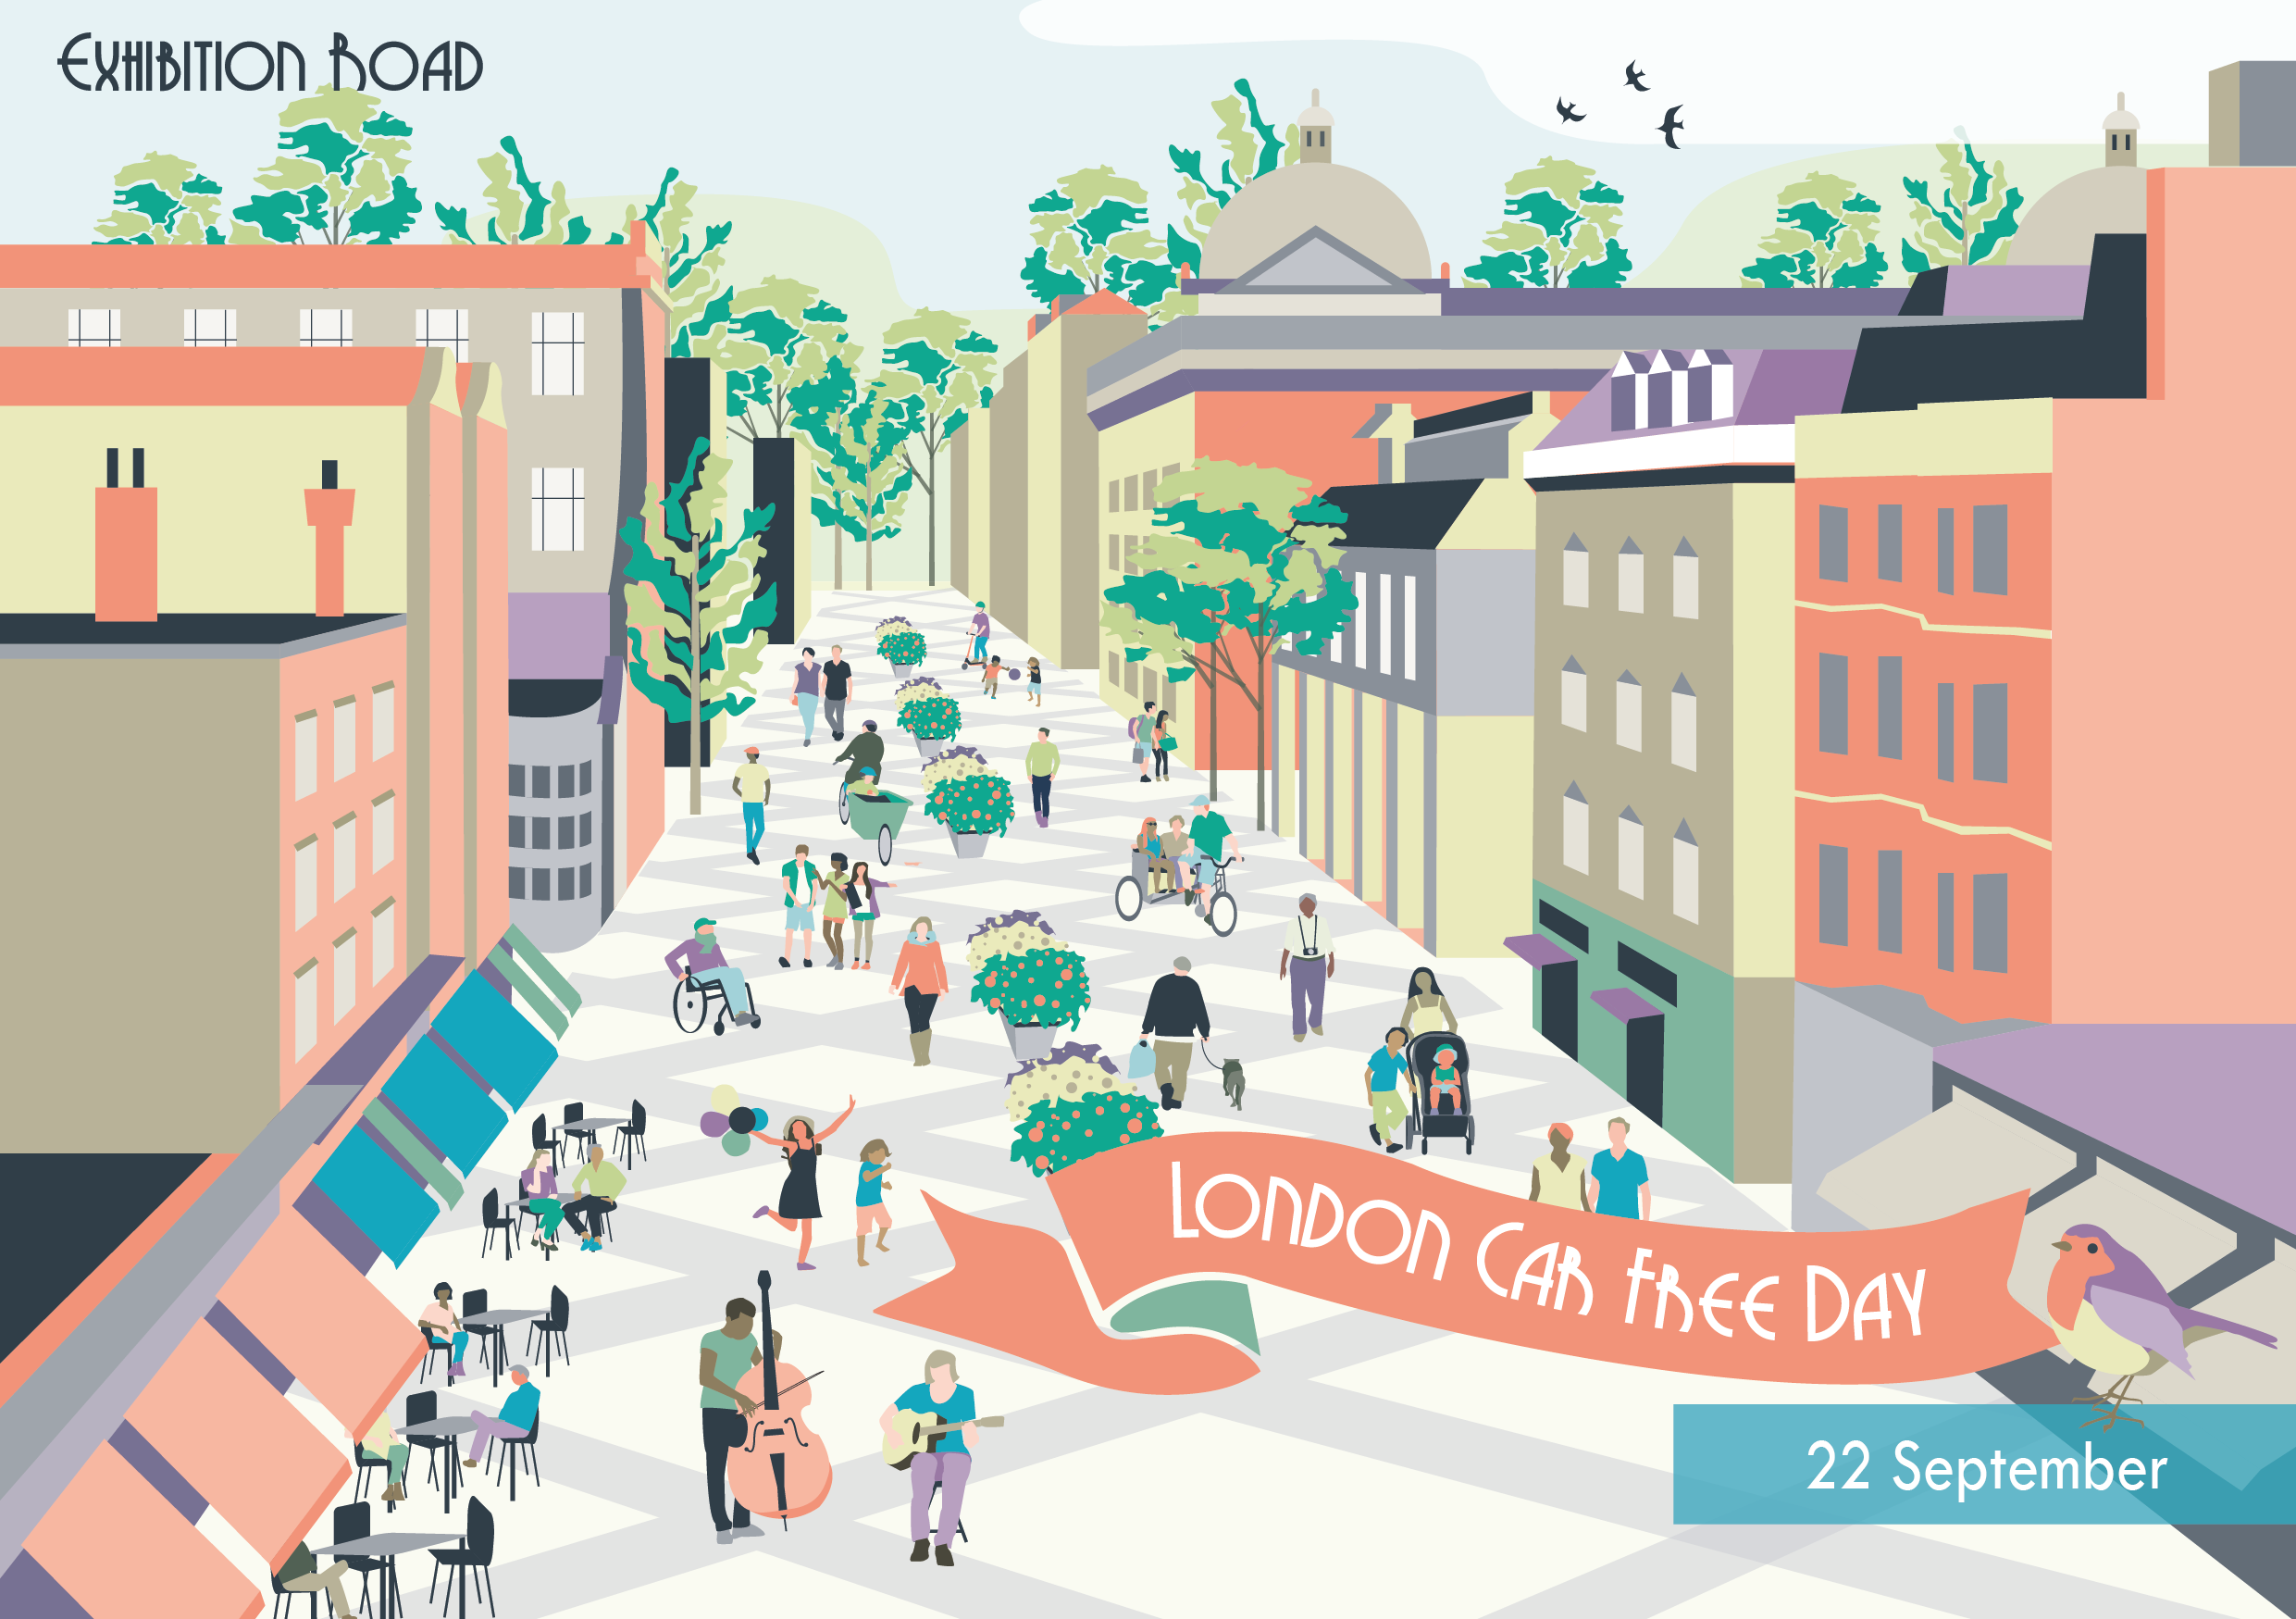 london_car_free_day_Postcards_7_Print-02.png